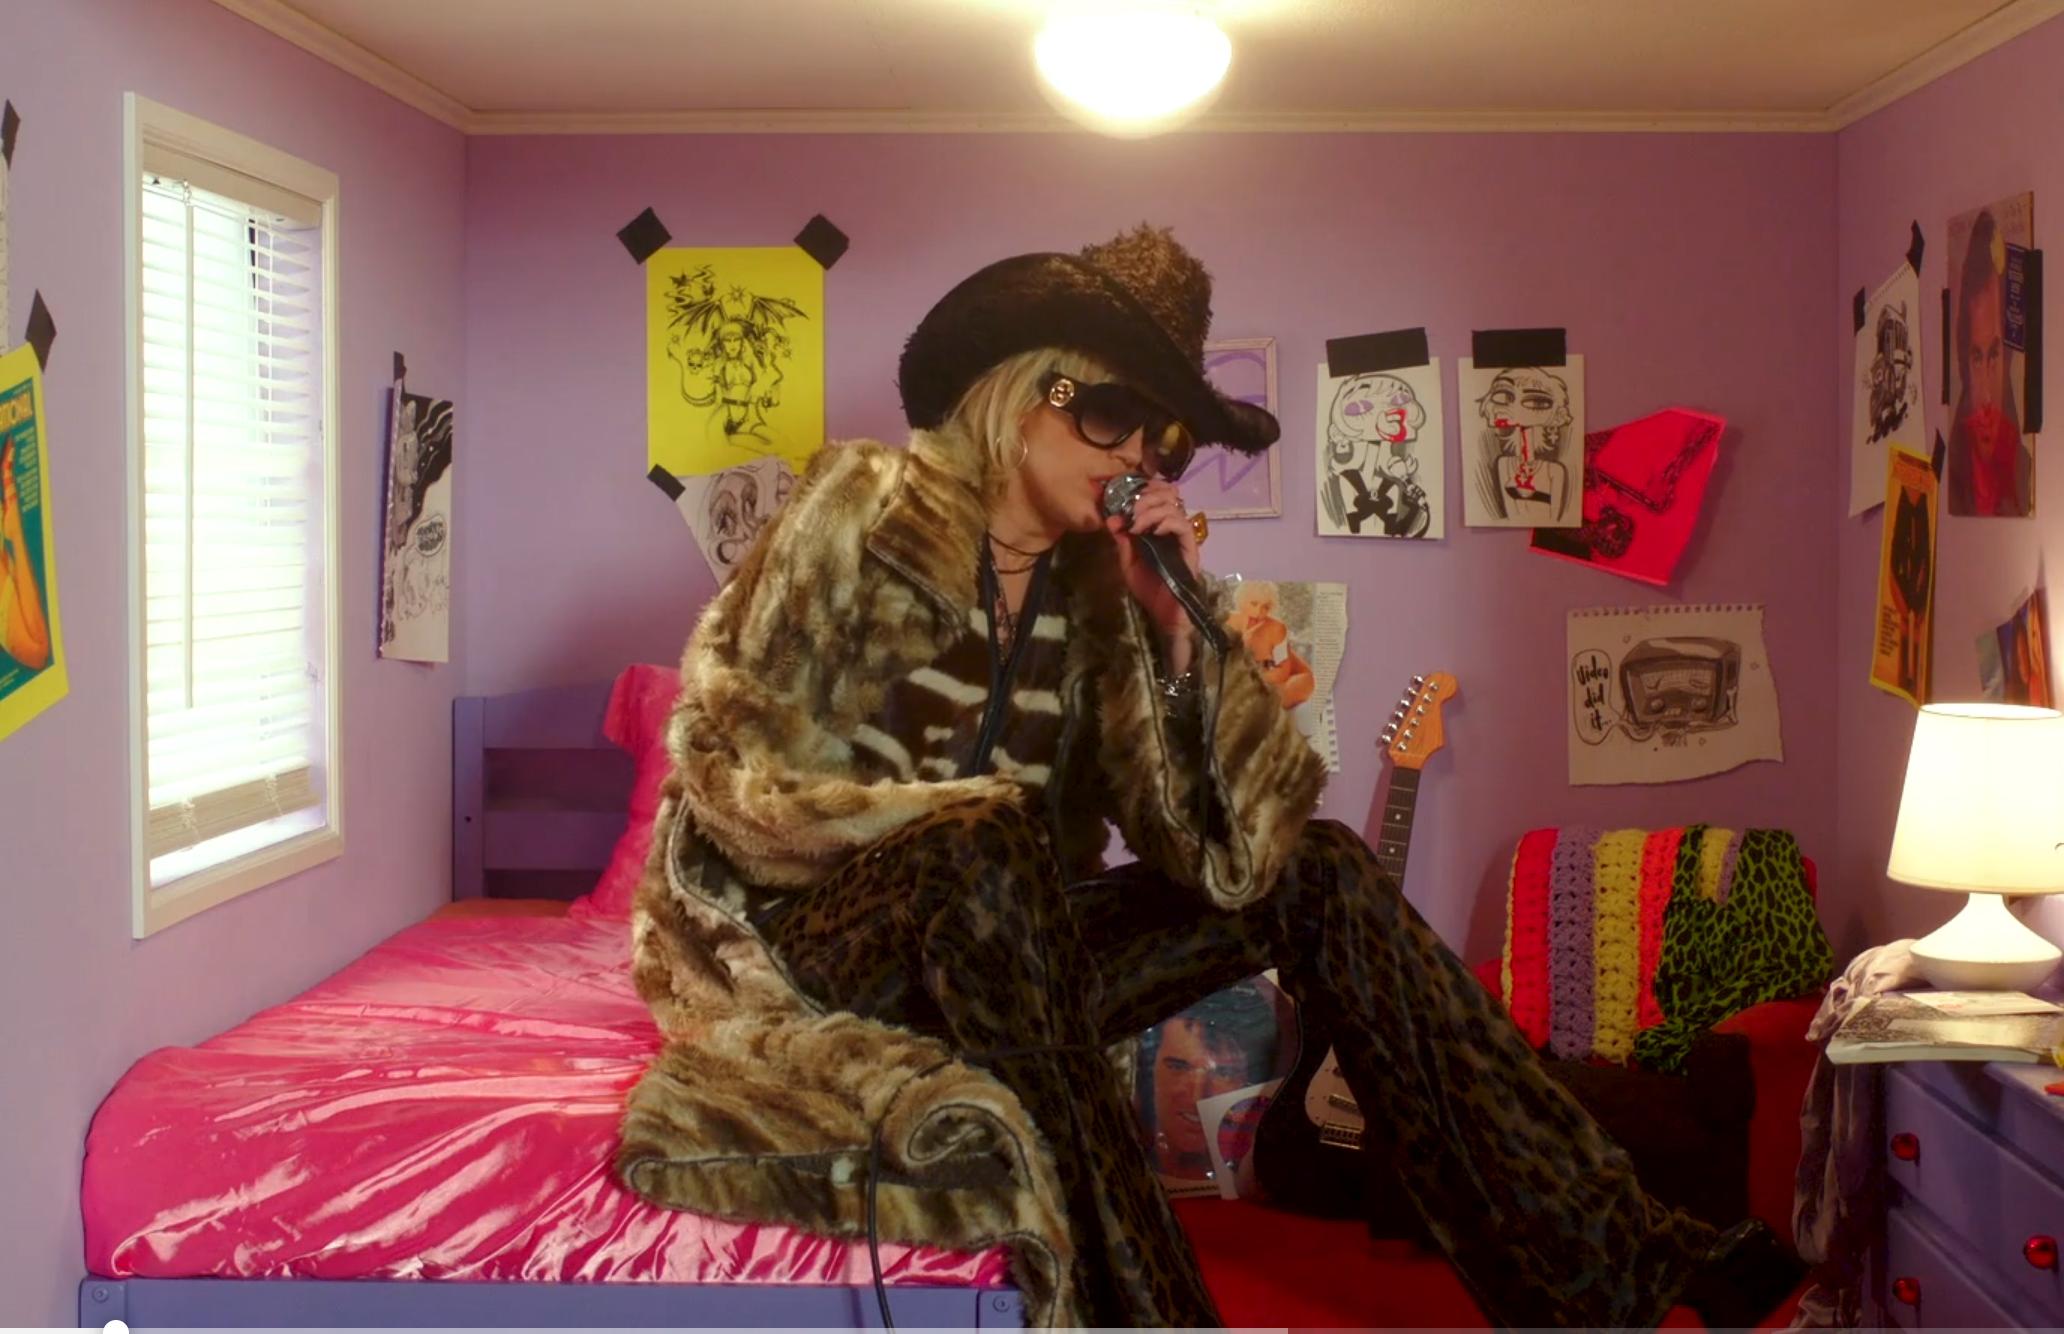 Miley Cyrus NPR concert